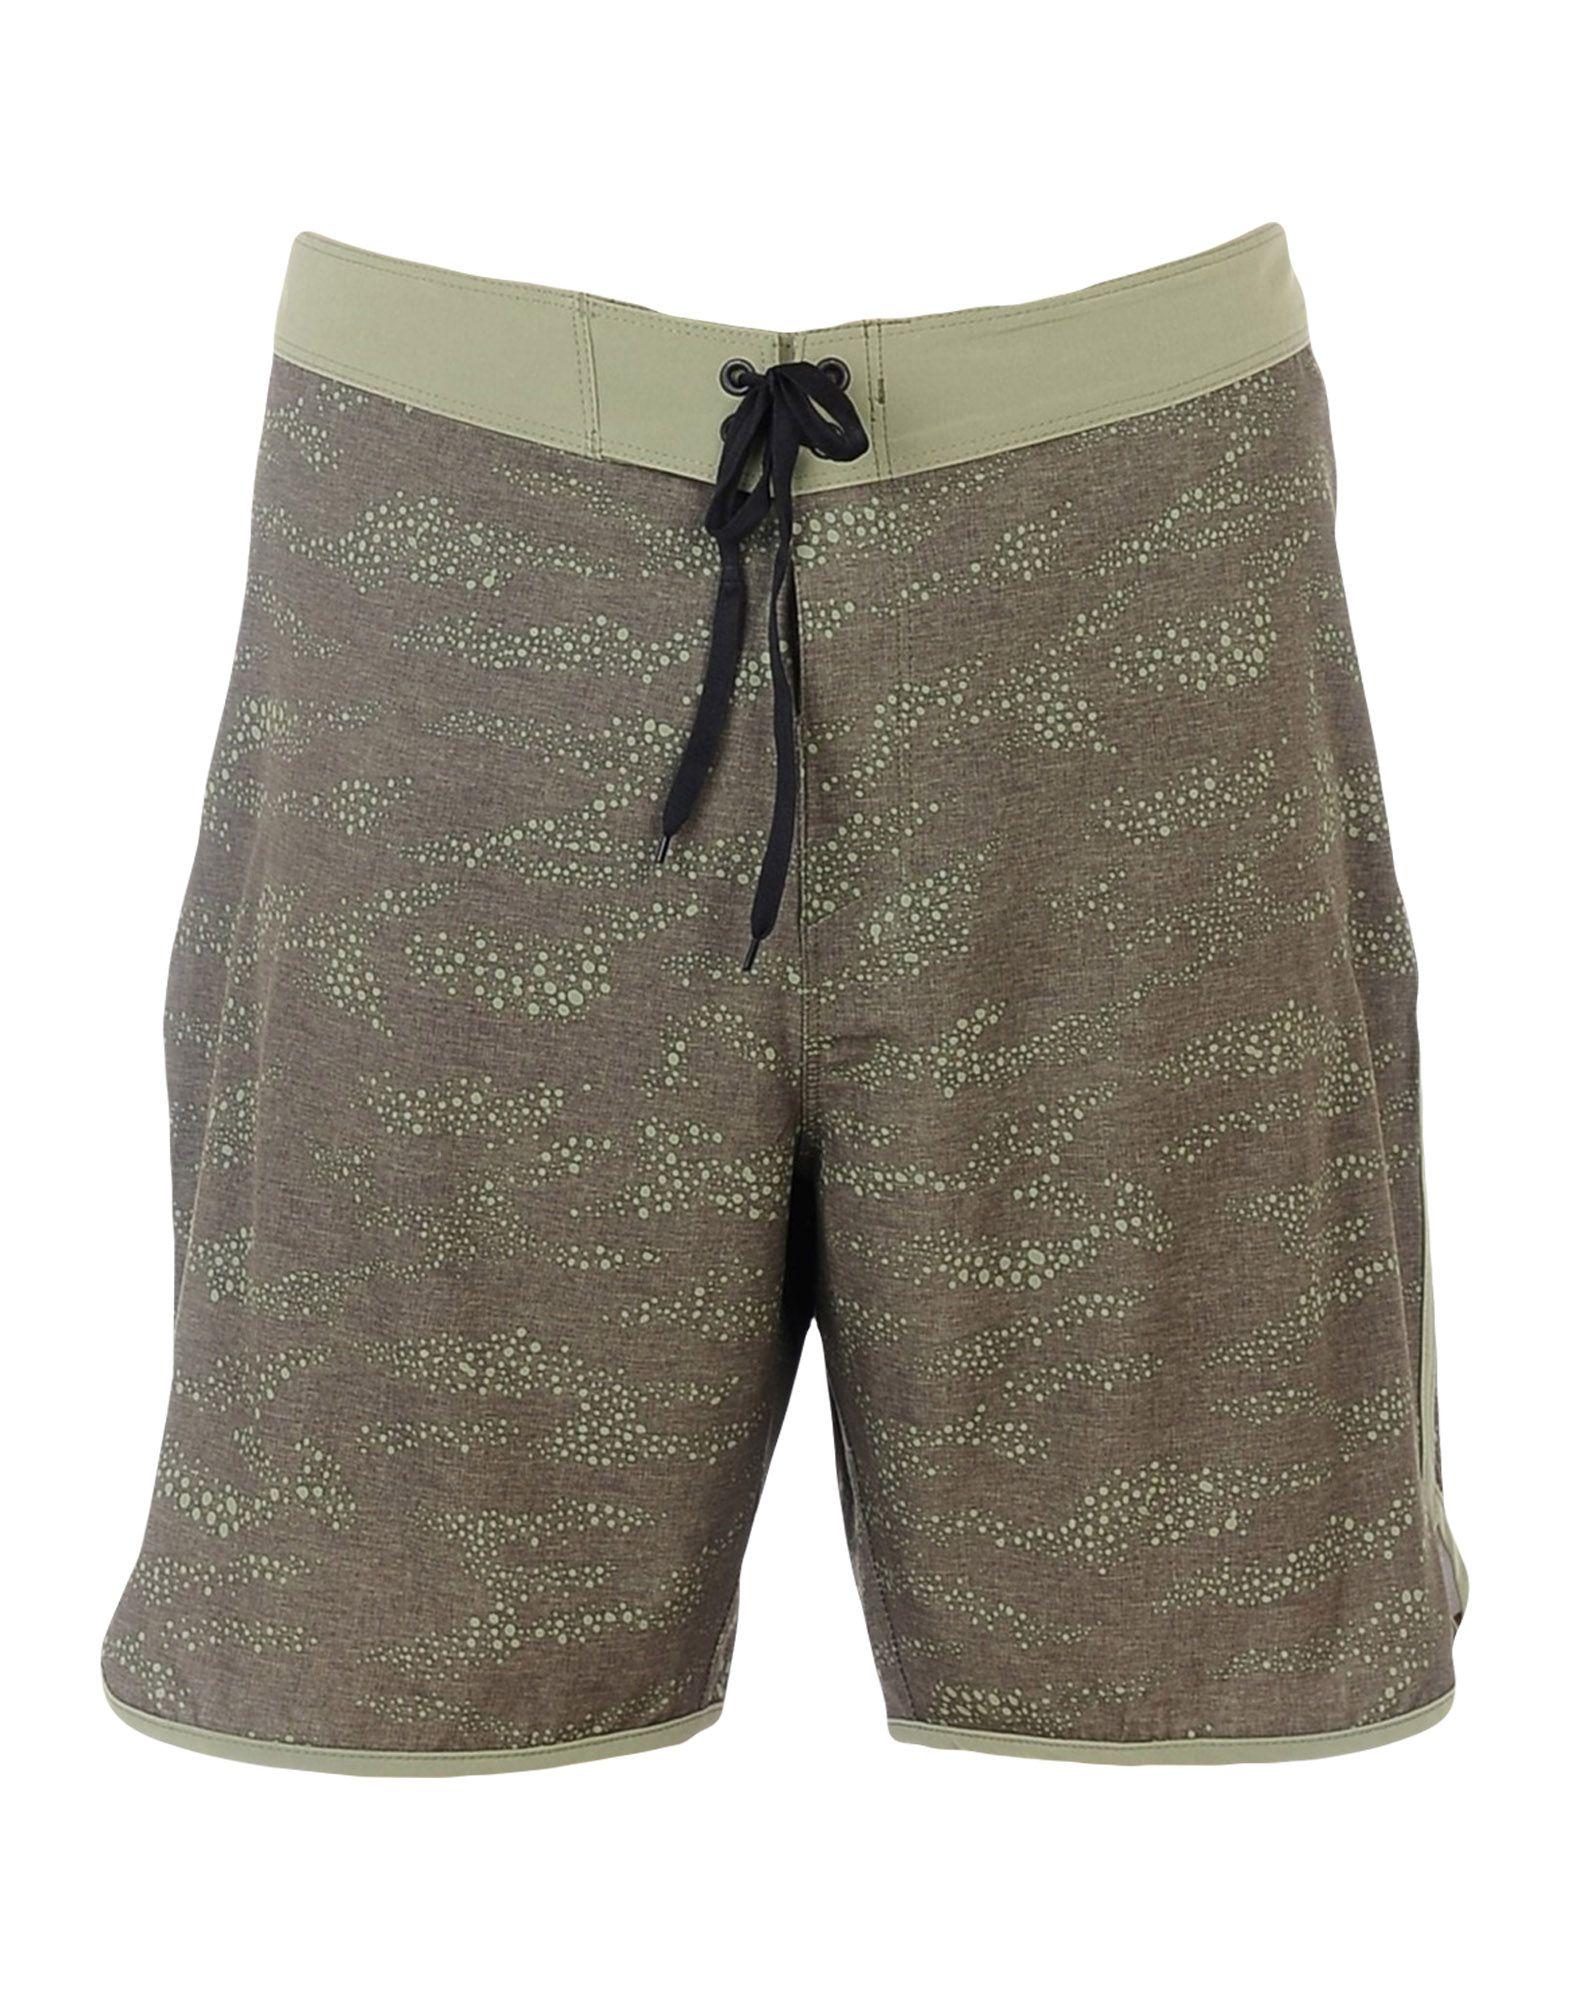 HURLEY Пляжные брюки и шорты шлепанцы hurley sample phantom sandals rifle